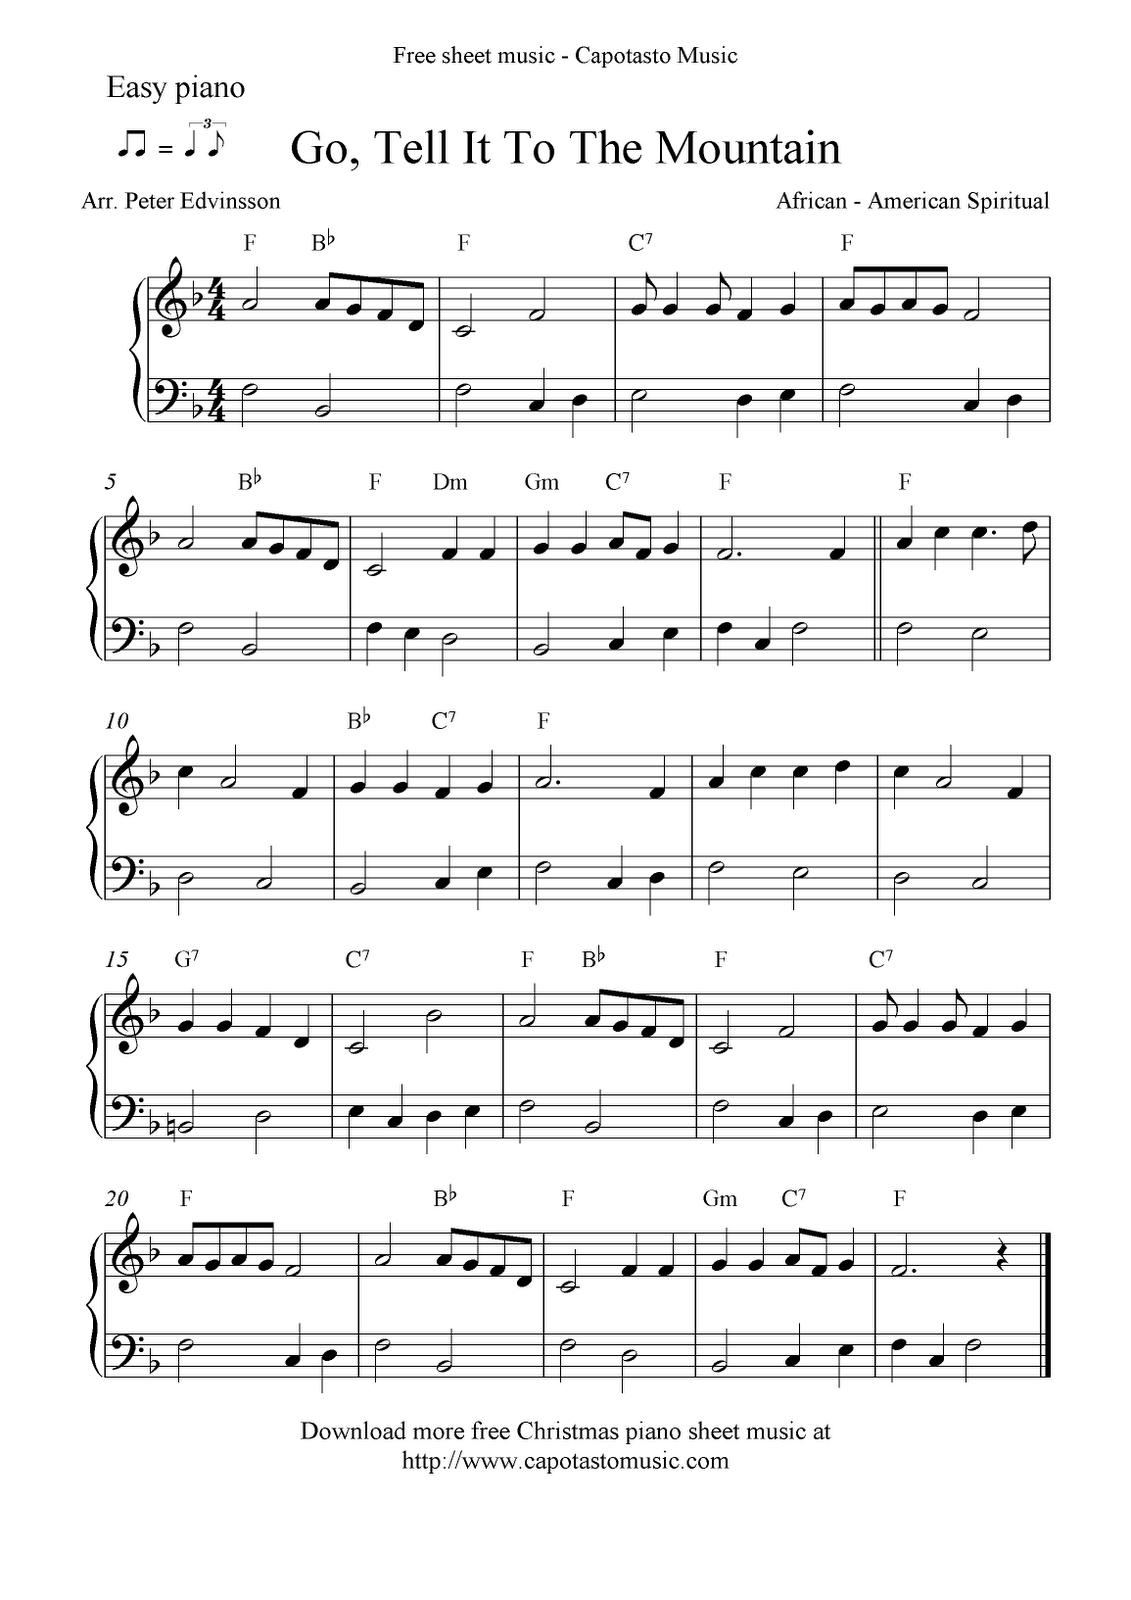 Free Printable Piano Sheet Music | Free Sheet Music Scores: Easy - Christmas Music For Piano Free Printable